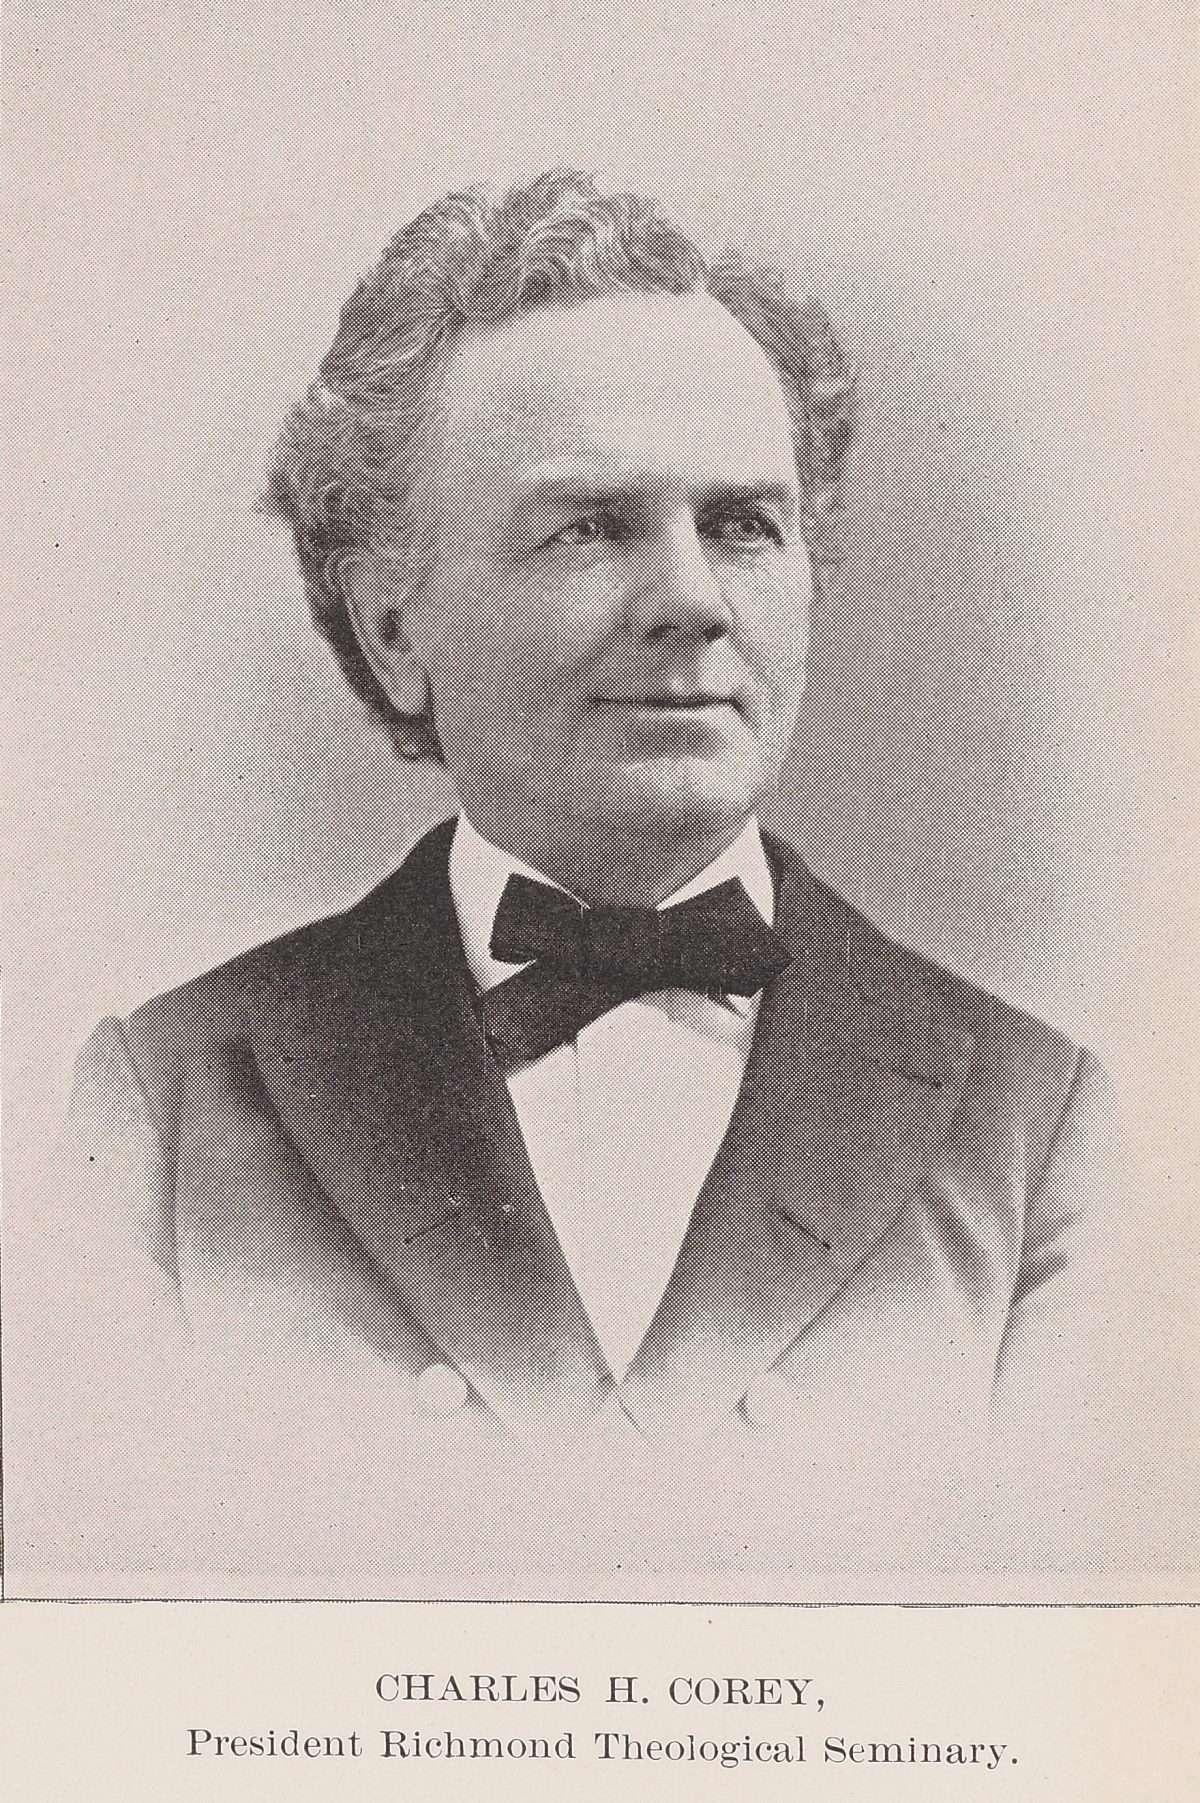 Charles H. Corey